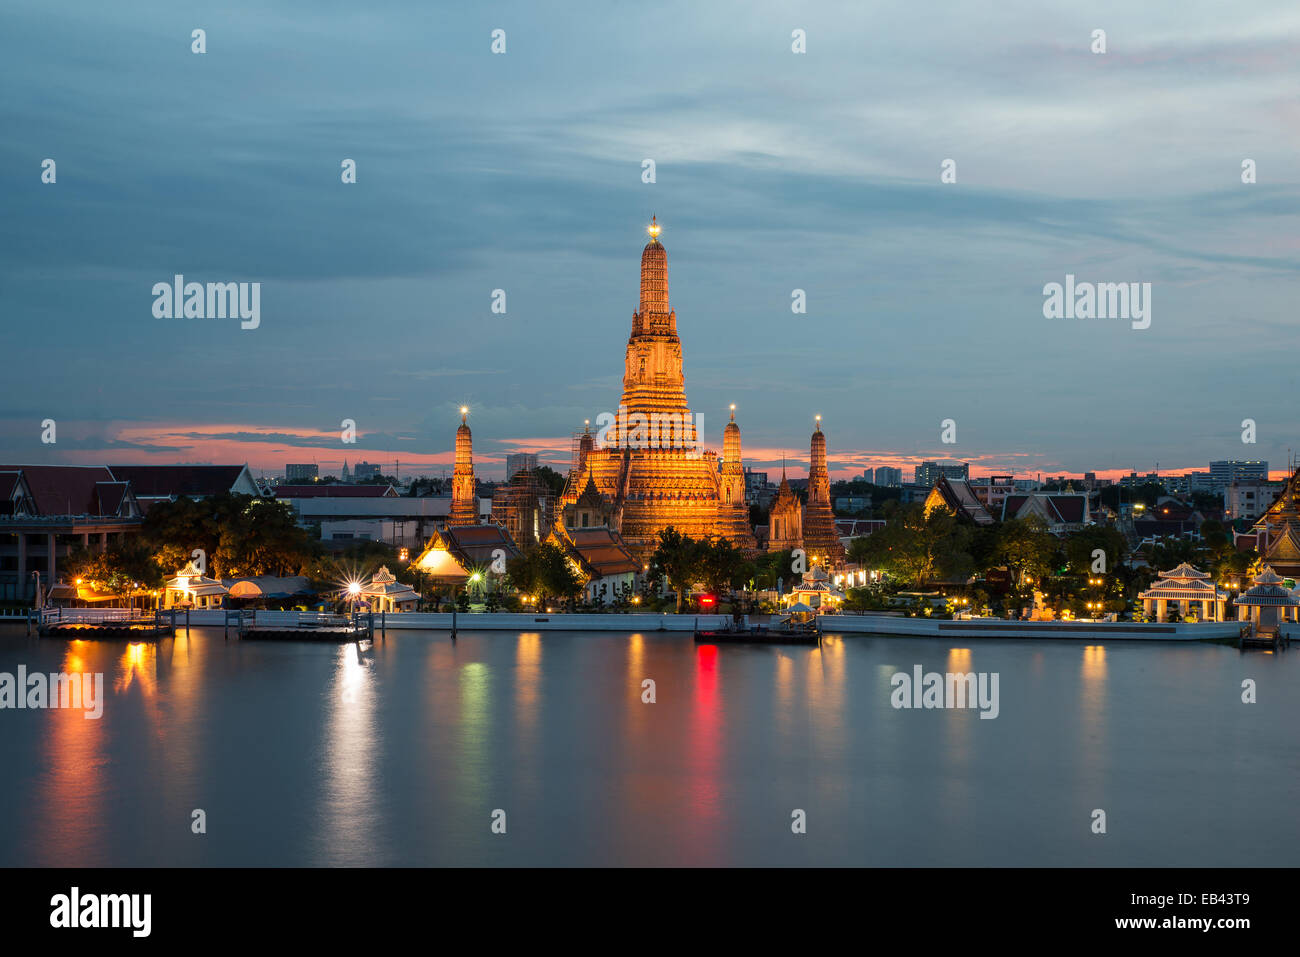 Wat Arun Buddhist religious places in twilight time, Bangkok, Thailand - Stock Image